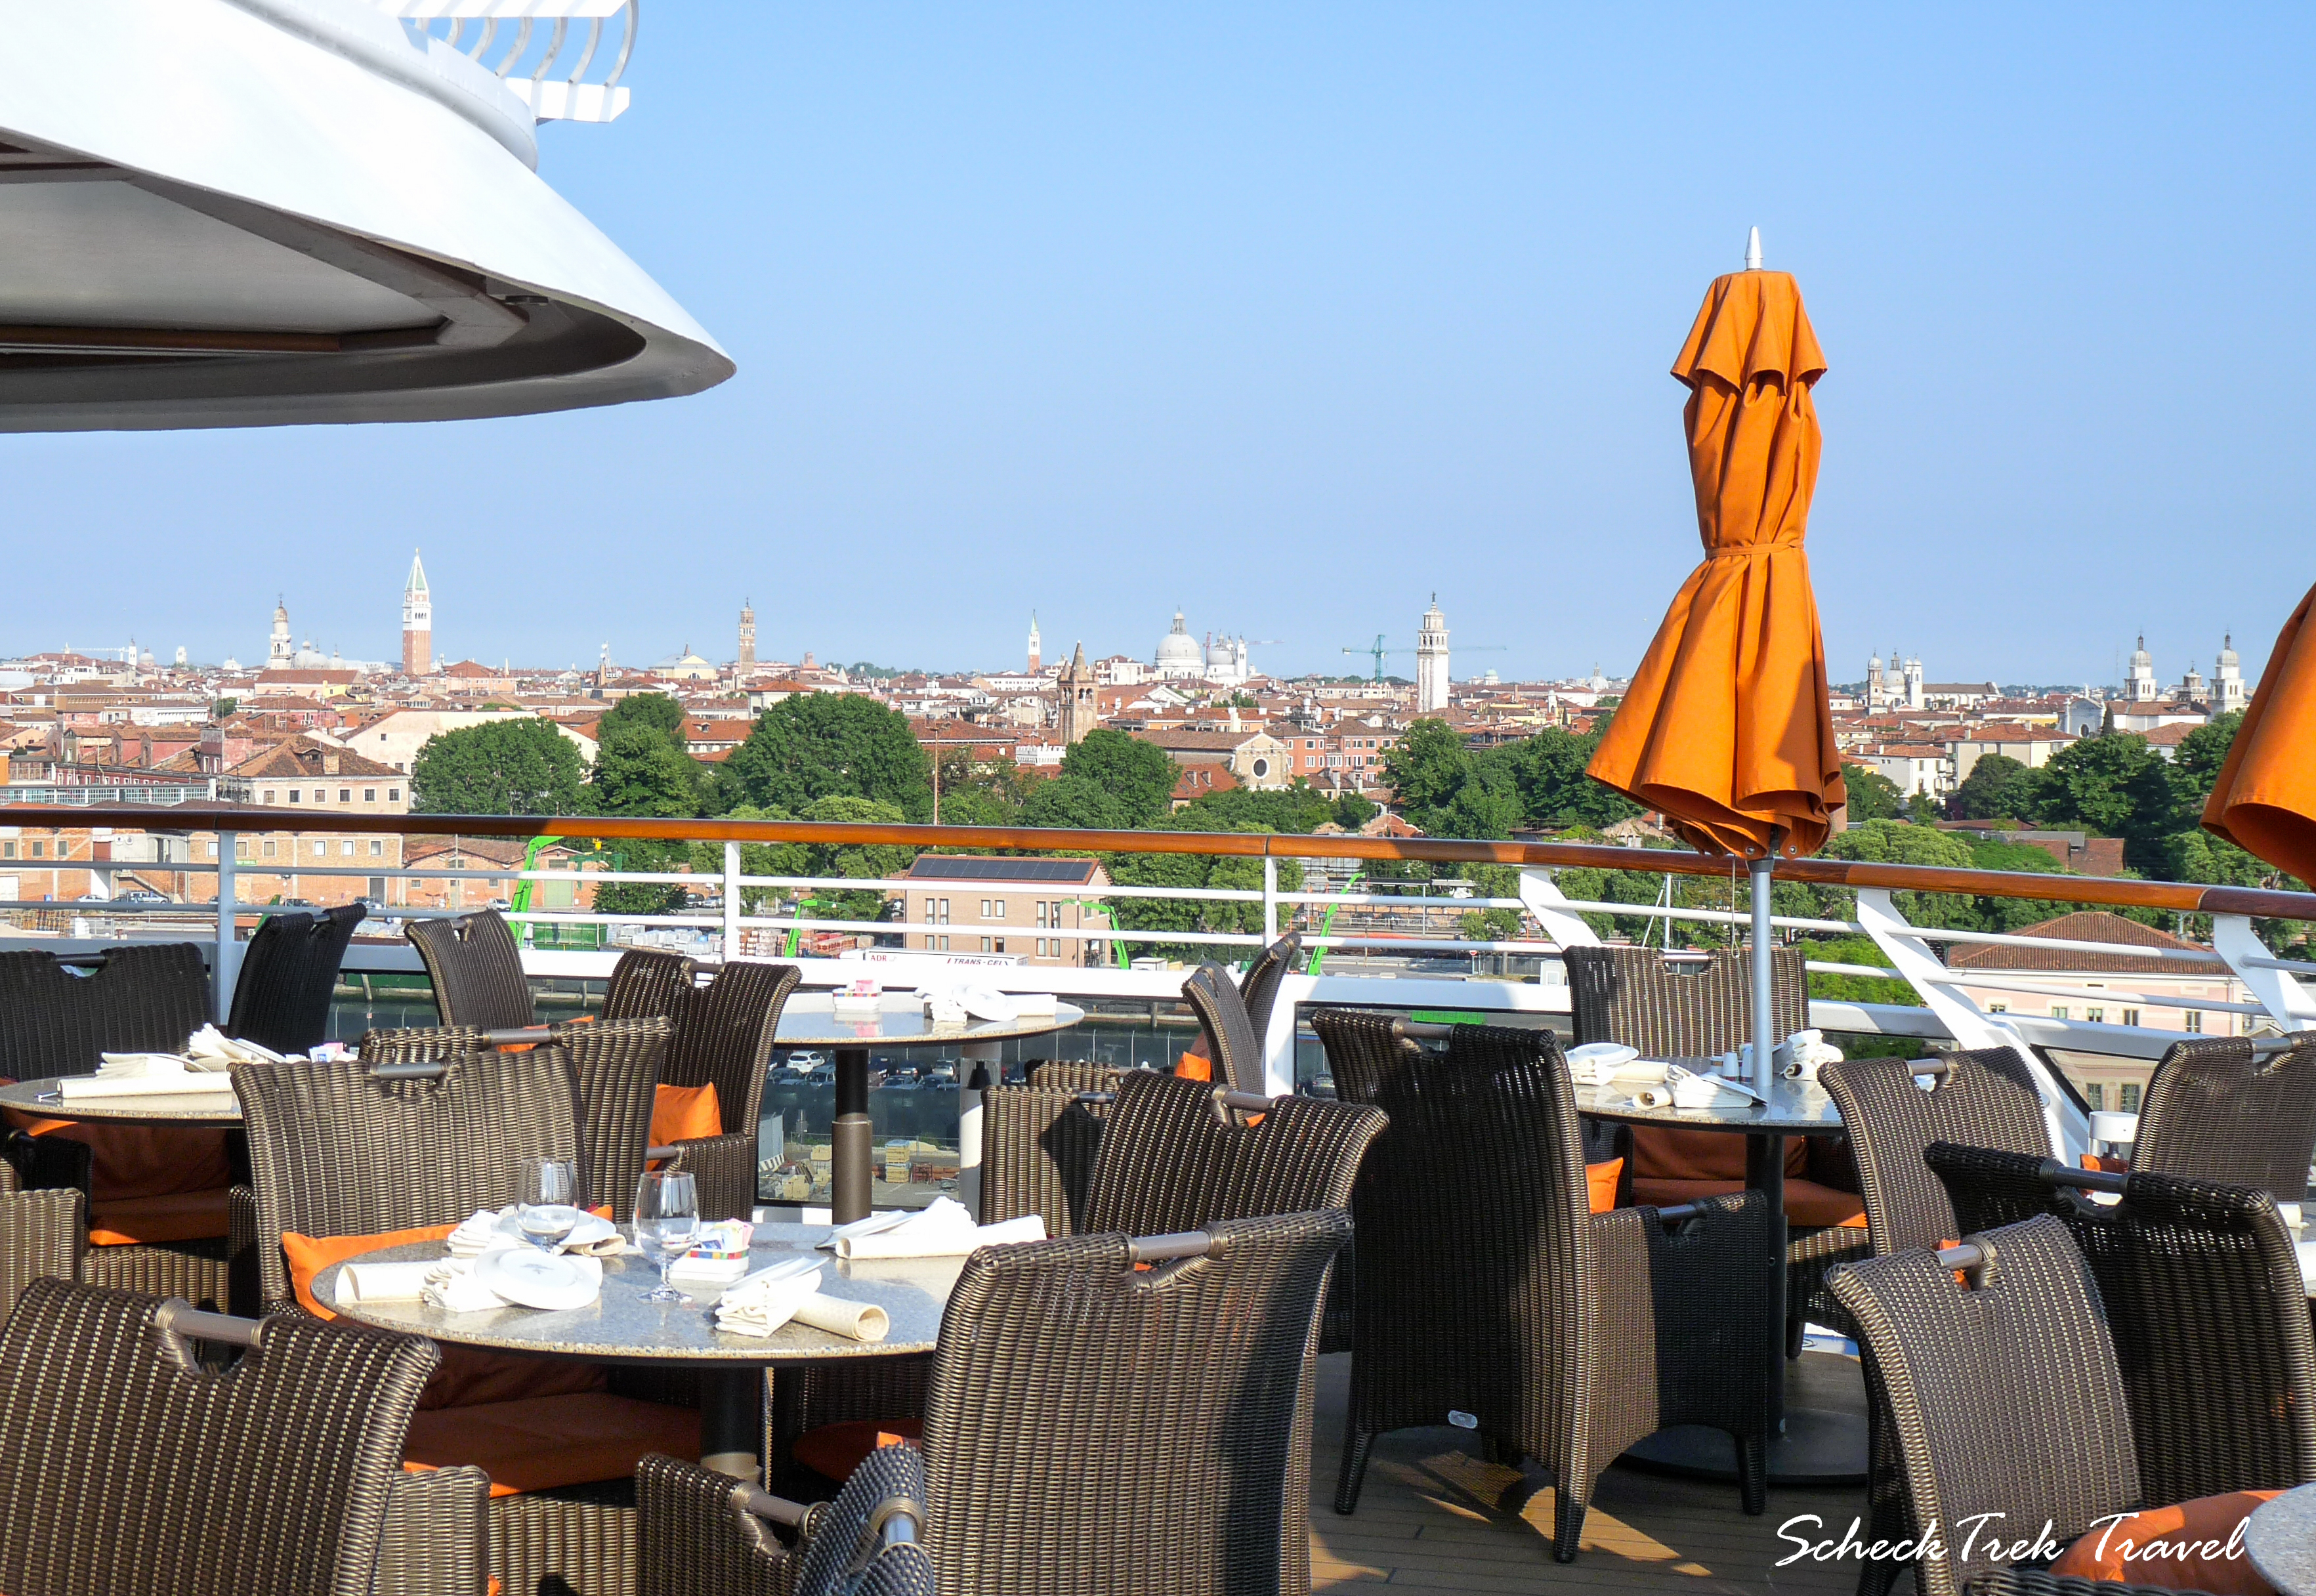 The Terrace Cafe overlooking Venice